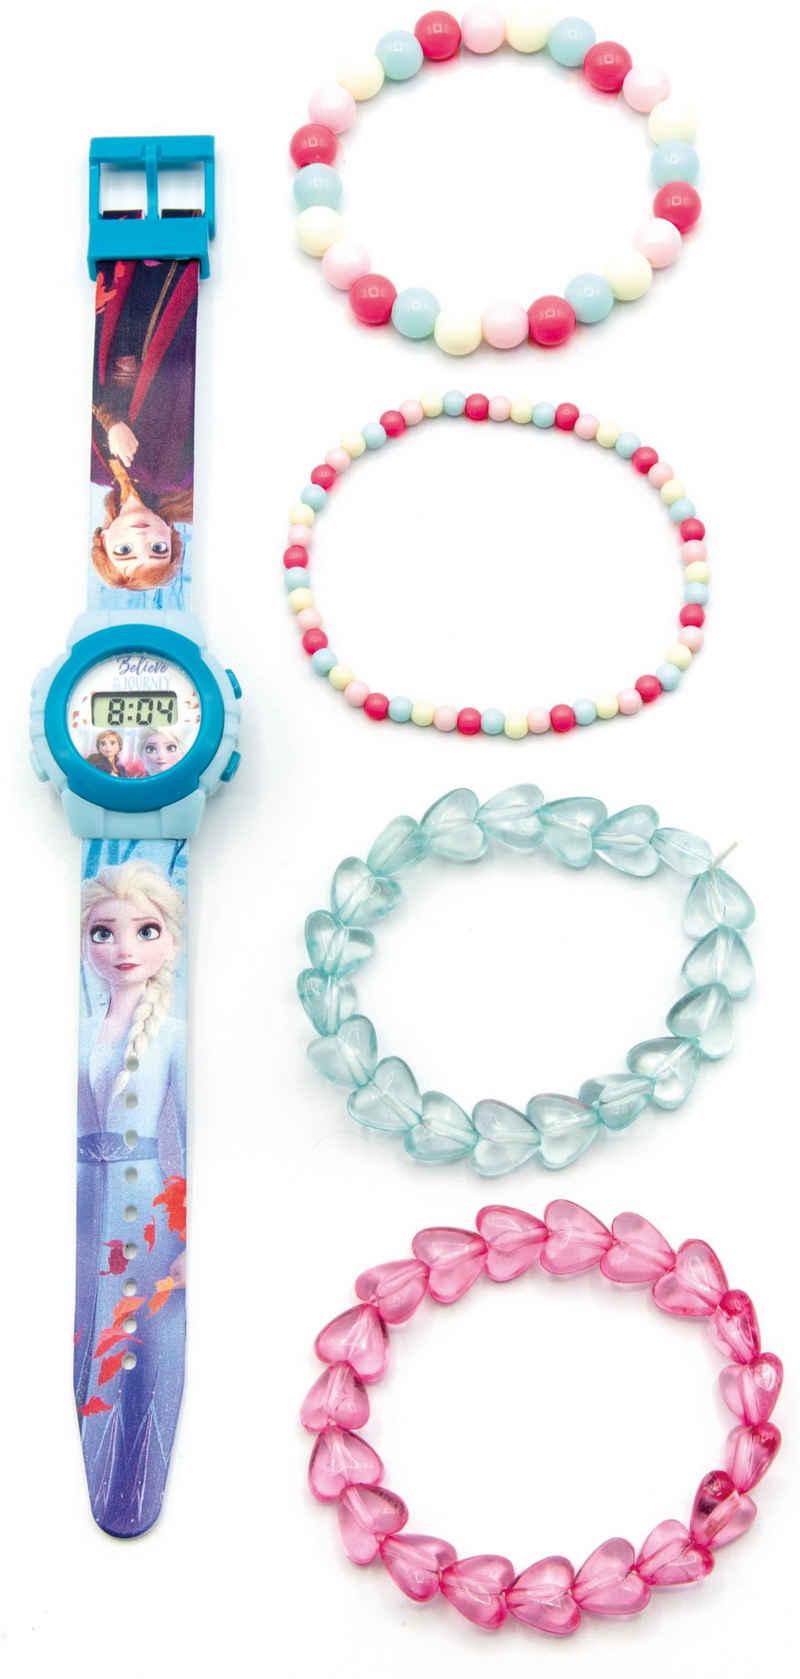 Joy Toy Digitaluhr »Disney Eiskönigin, 20750«, (Packung, 5-tlg., LCD Uhr mit 4 Perlenarmbändern)